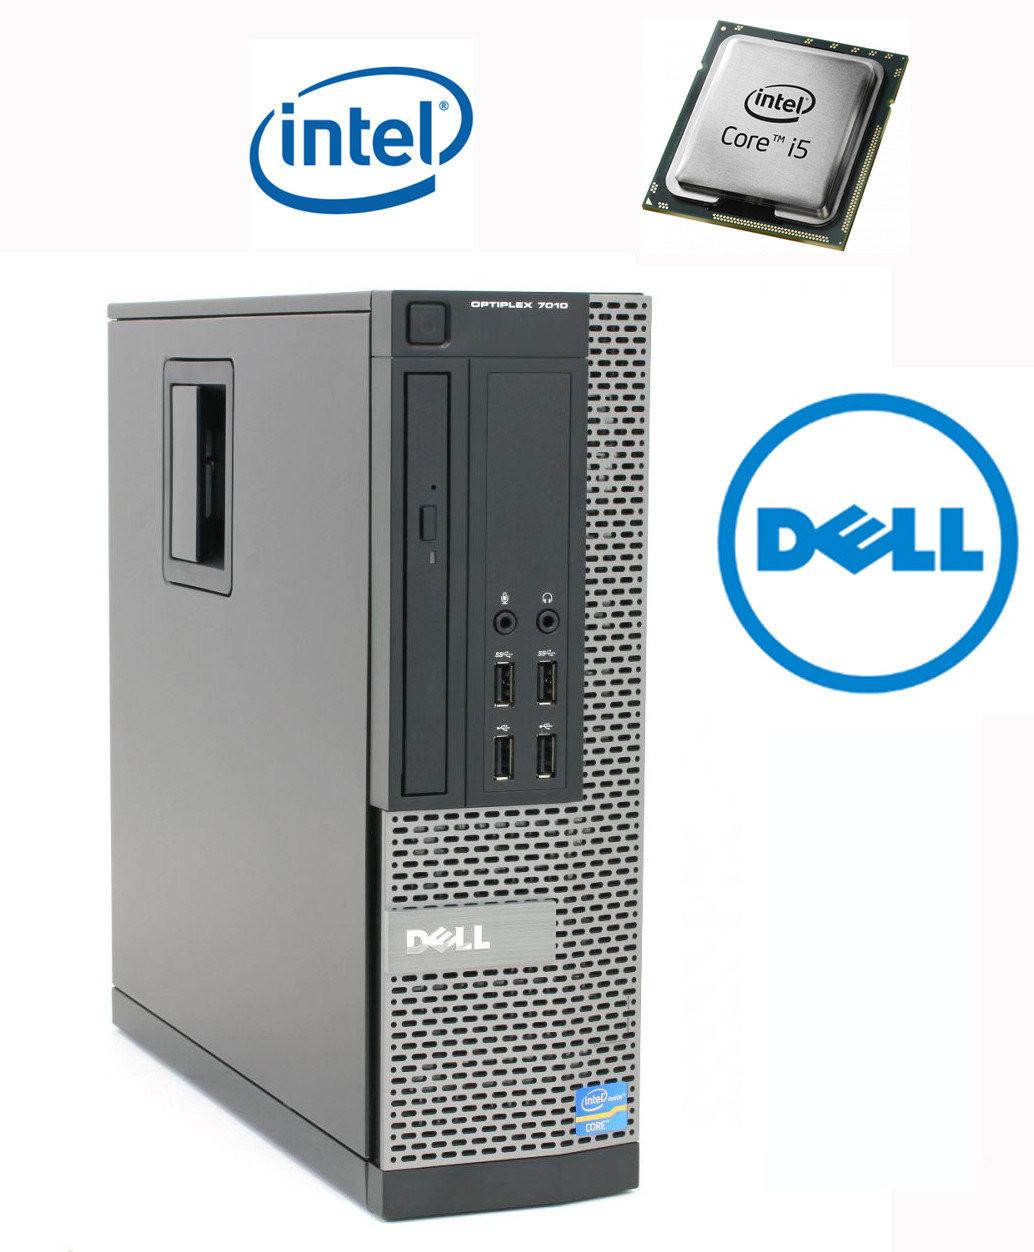 Системный блок DELL Optiplex 7010 4Gb оперативной памяти без HDD c CD-Rom